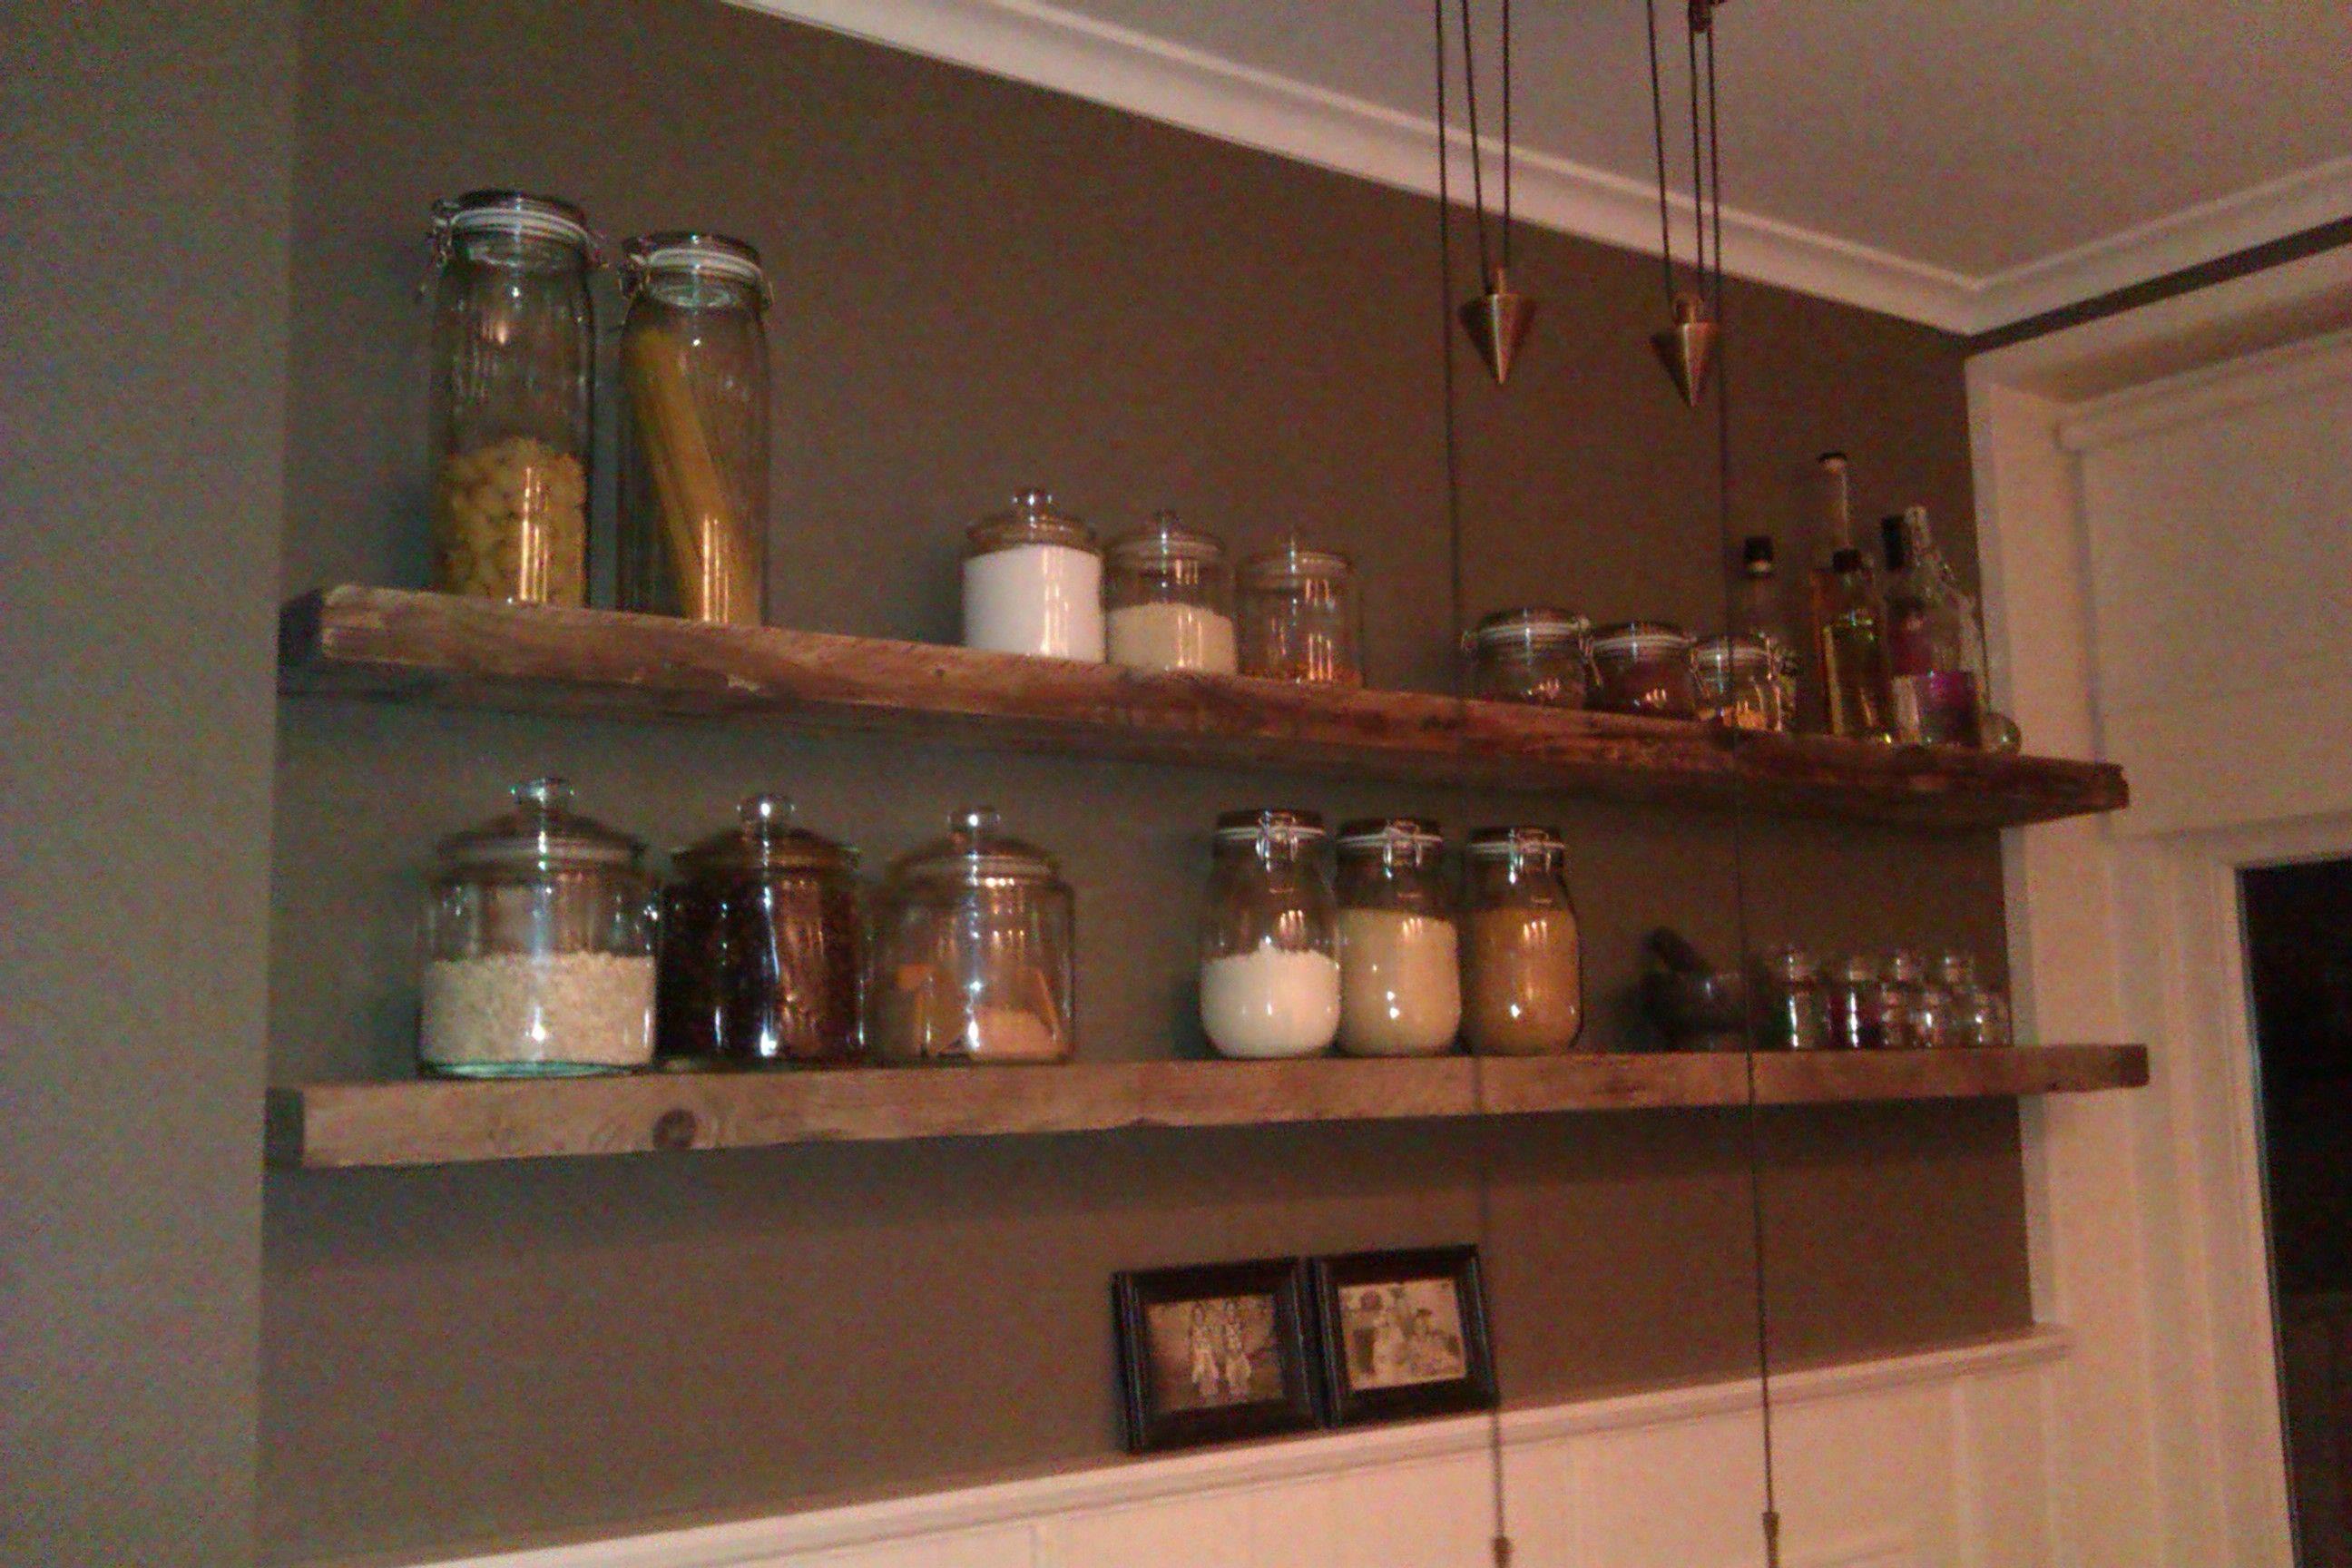 Diy zelfmaak idee n on pinterest 28 pins - Tegelwand idee keuken ...